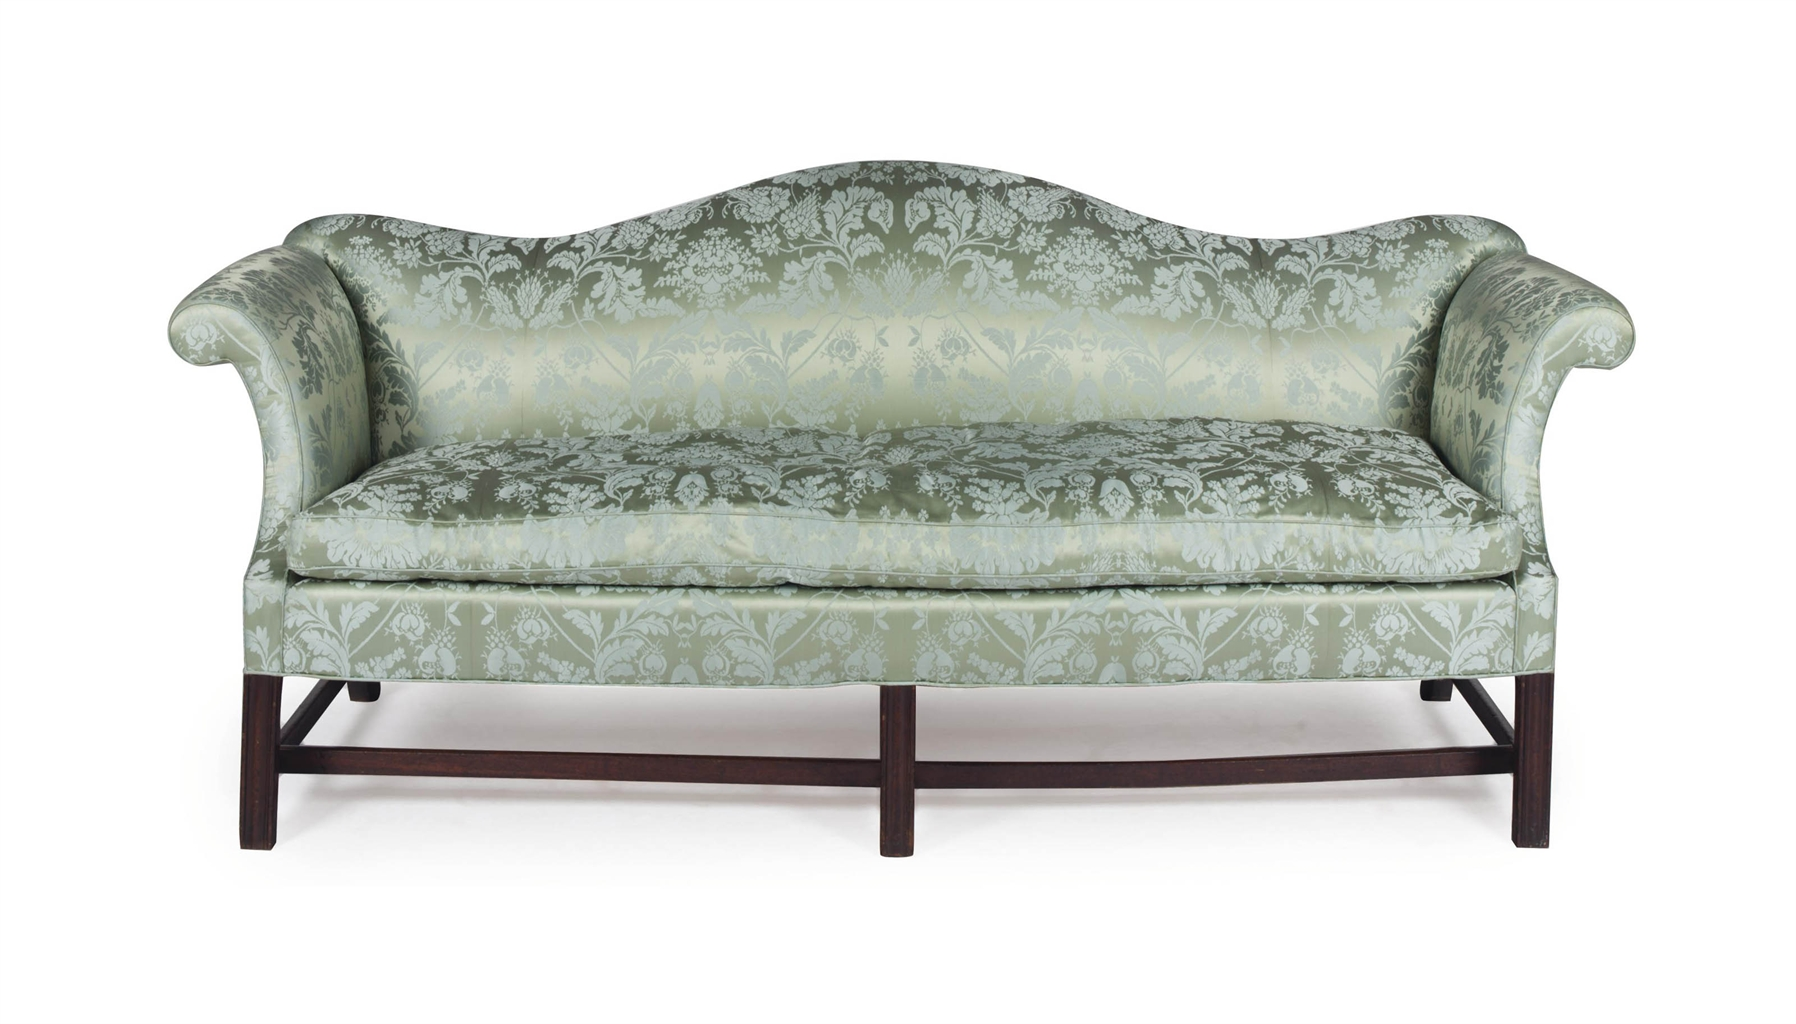 An English Oak And Green Blue Silk Damask Upholstered Sofa